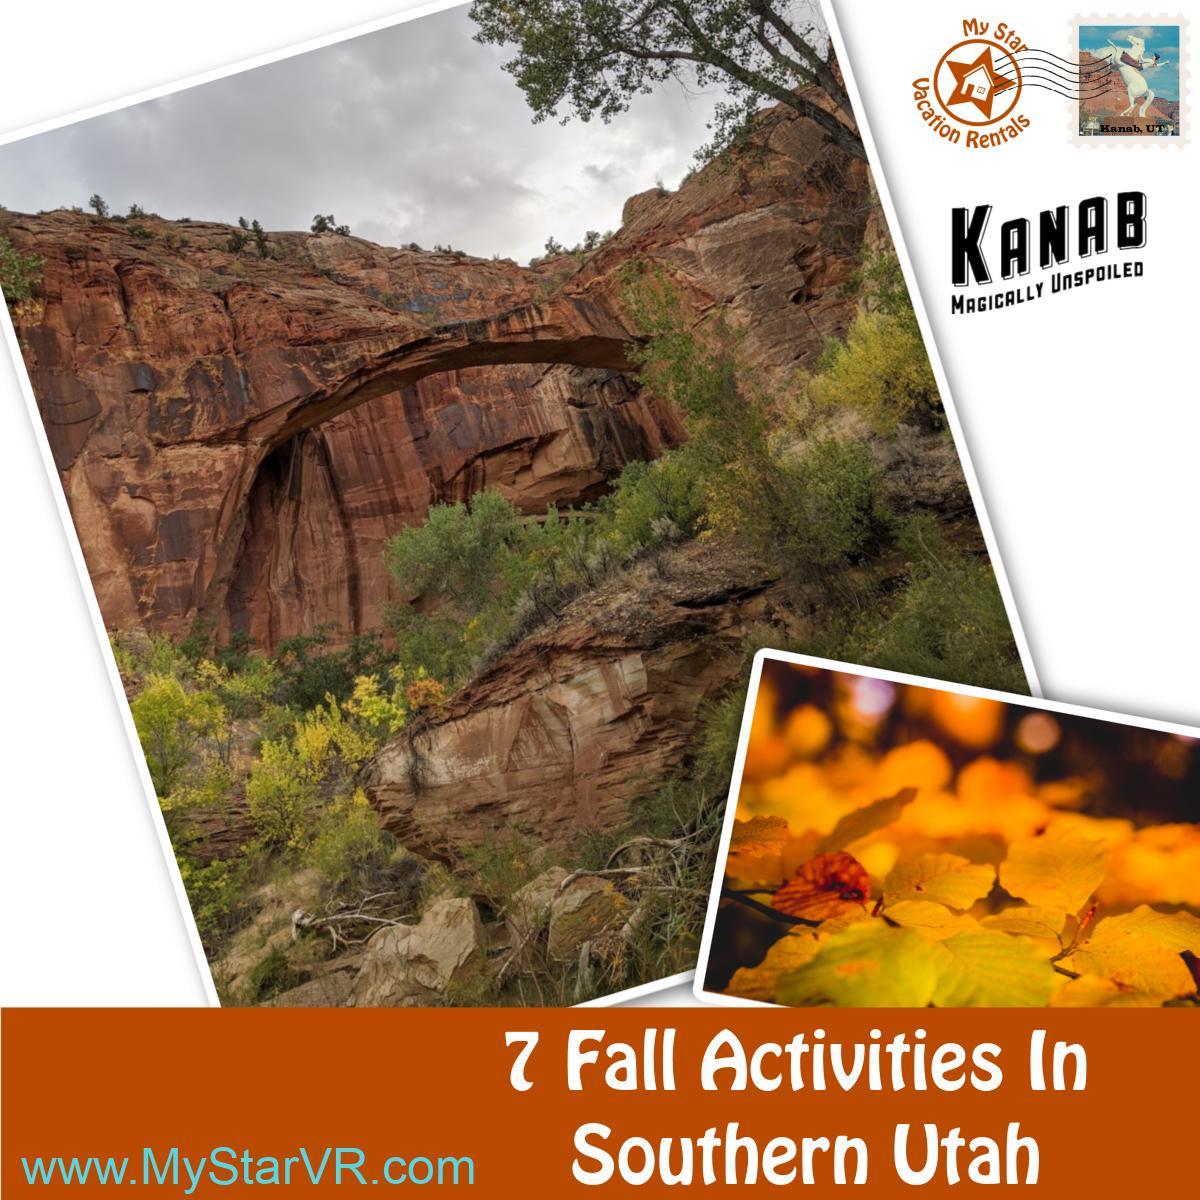 7 Fall activities